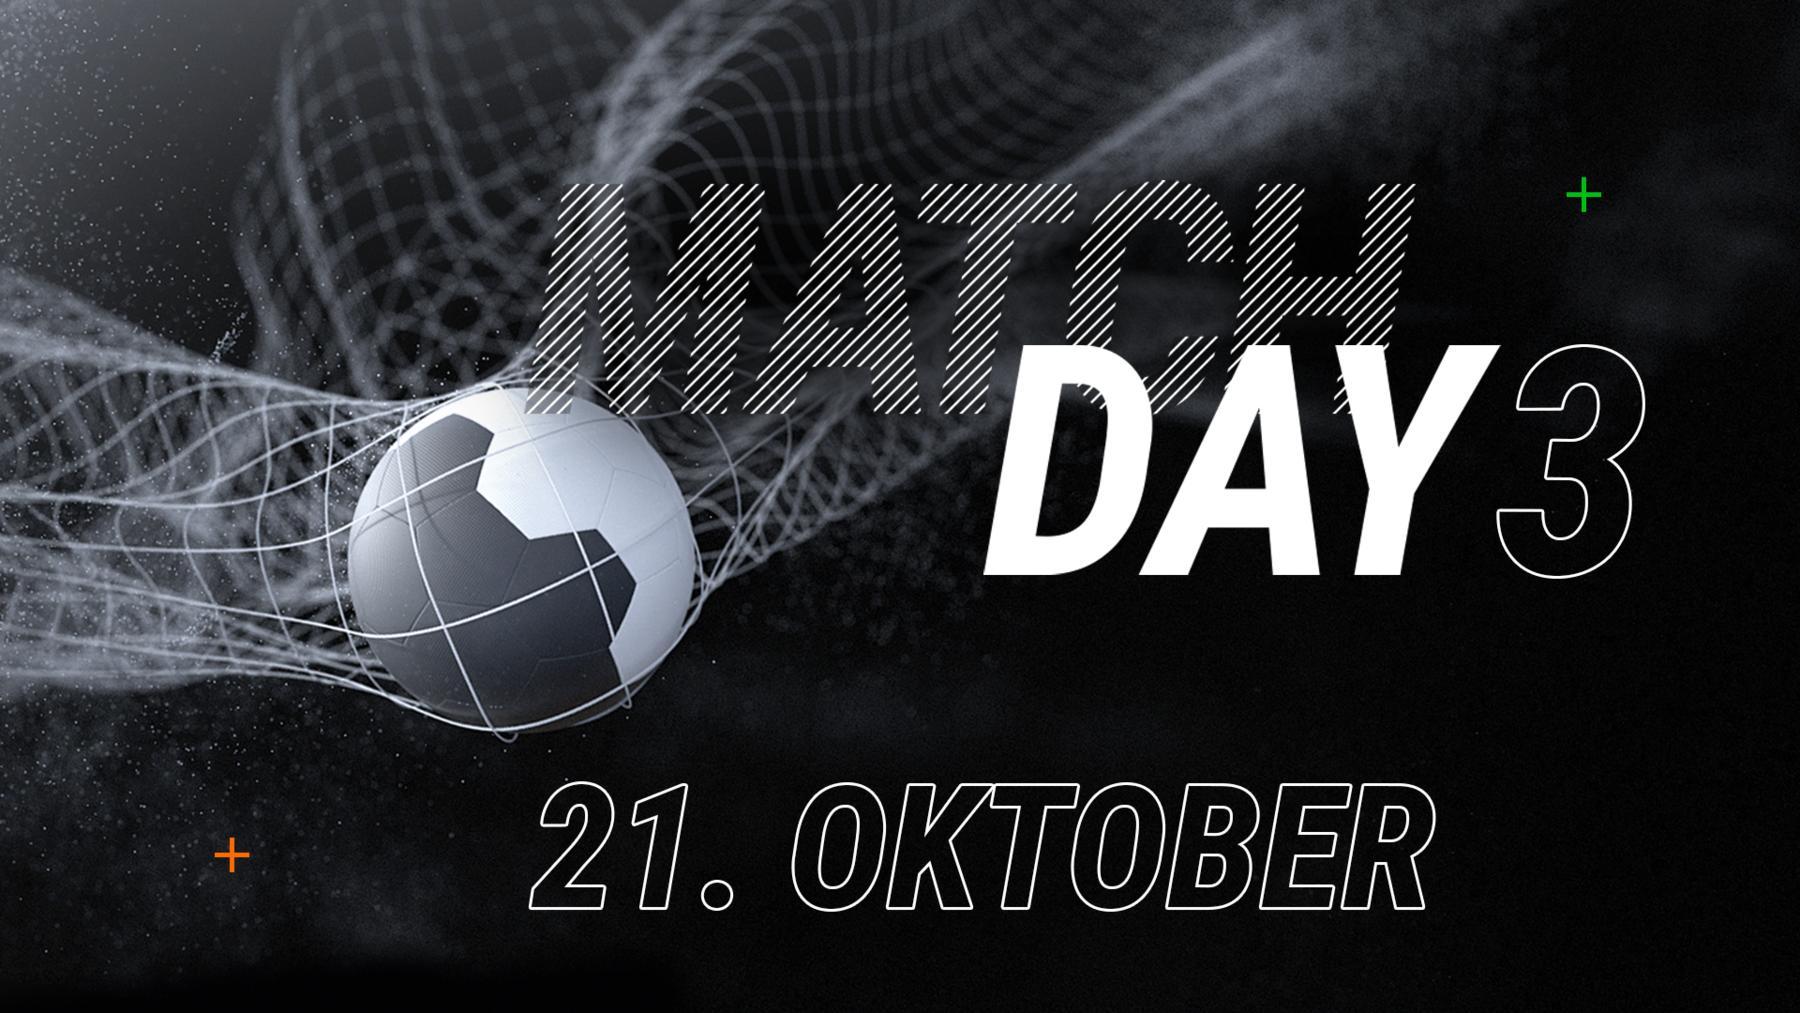 Matchday 3